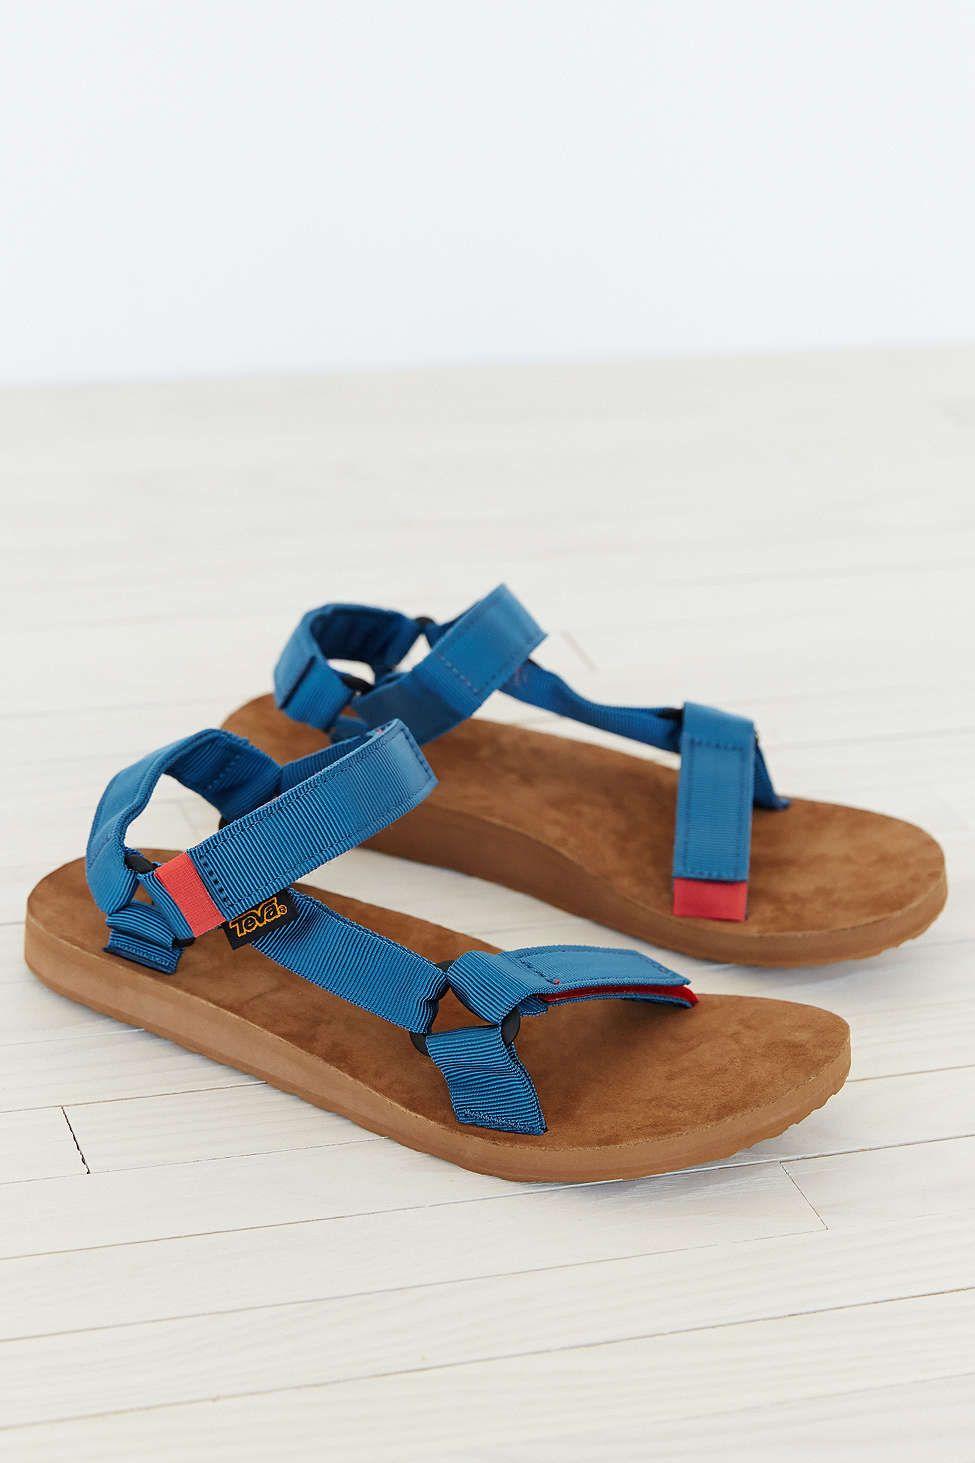 435e8b703d40 Teva Suede Original Universal Men s Sandal